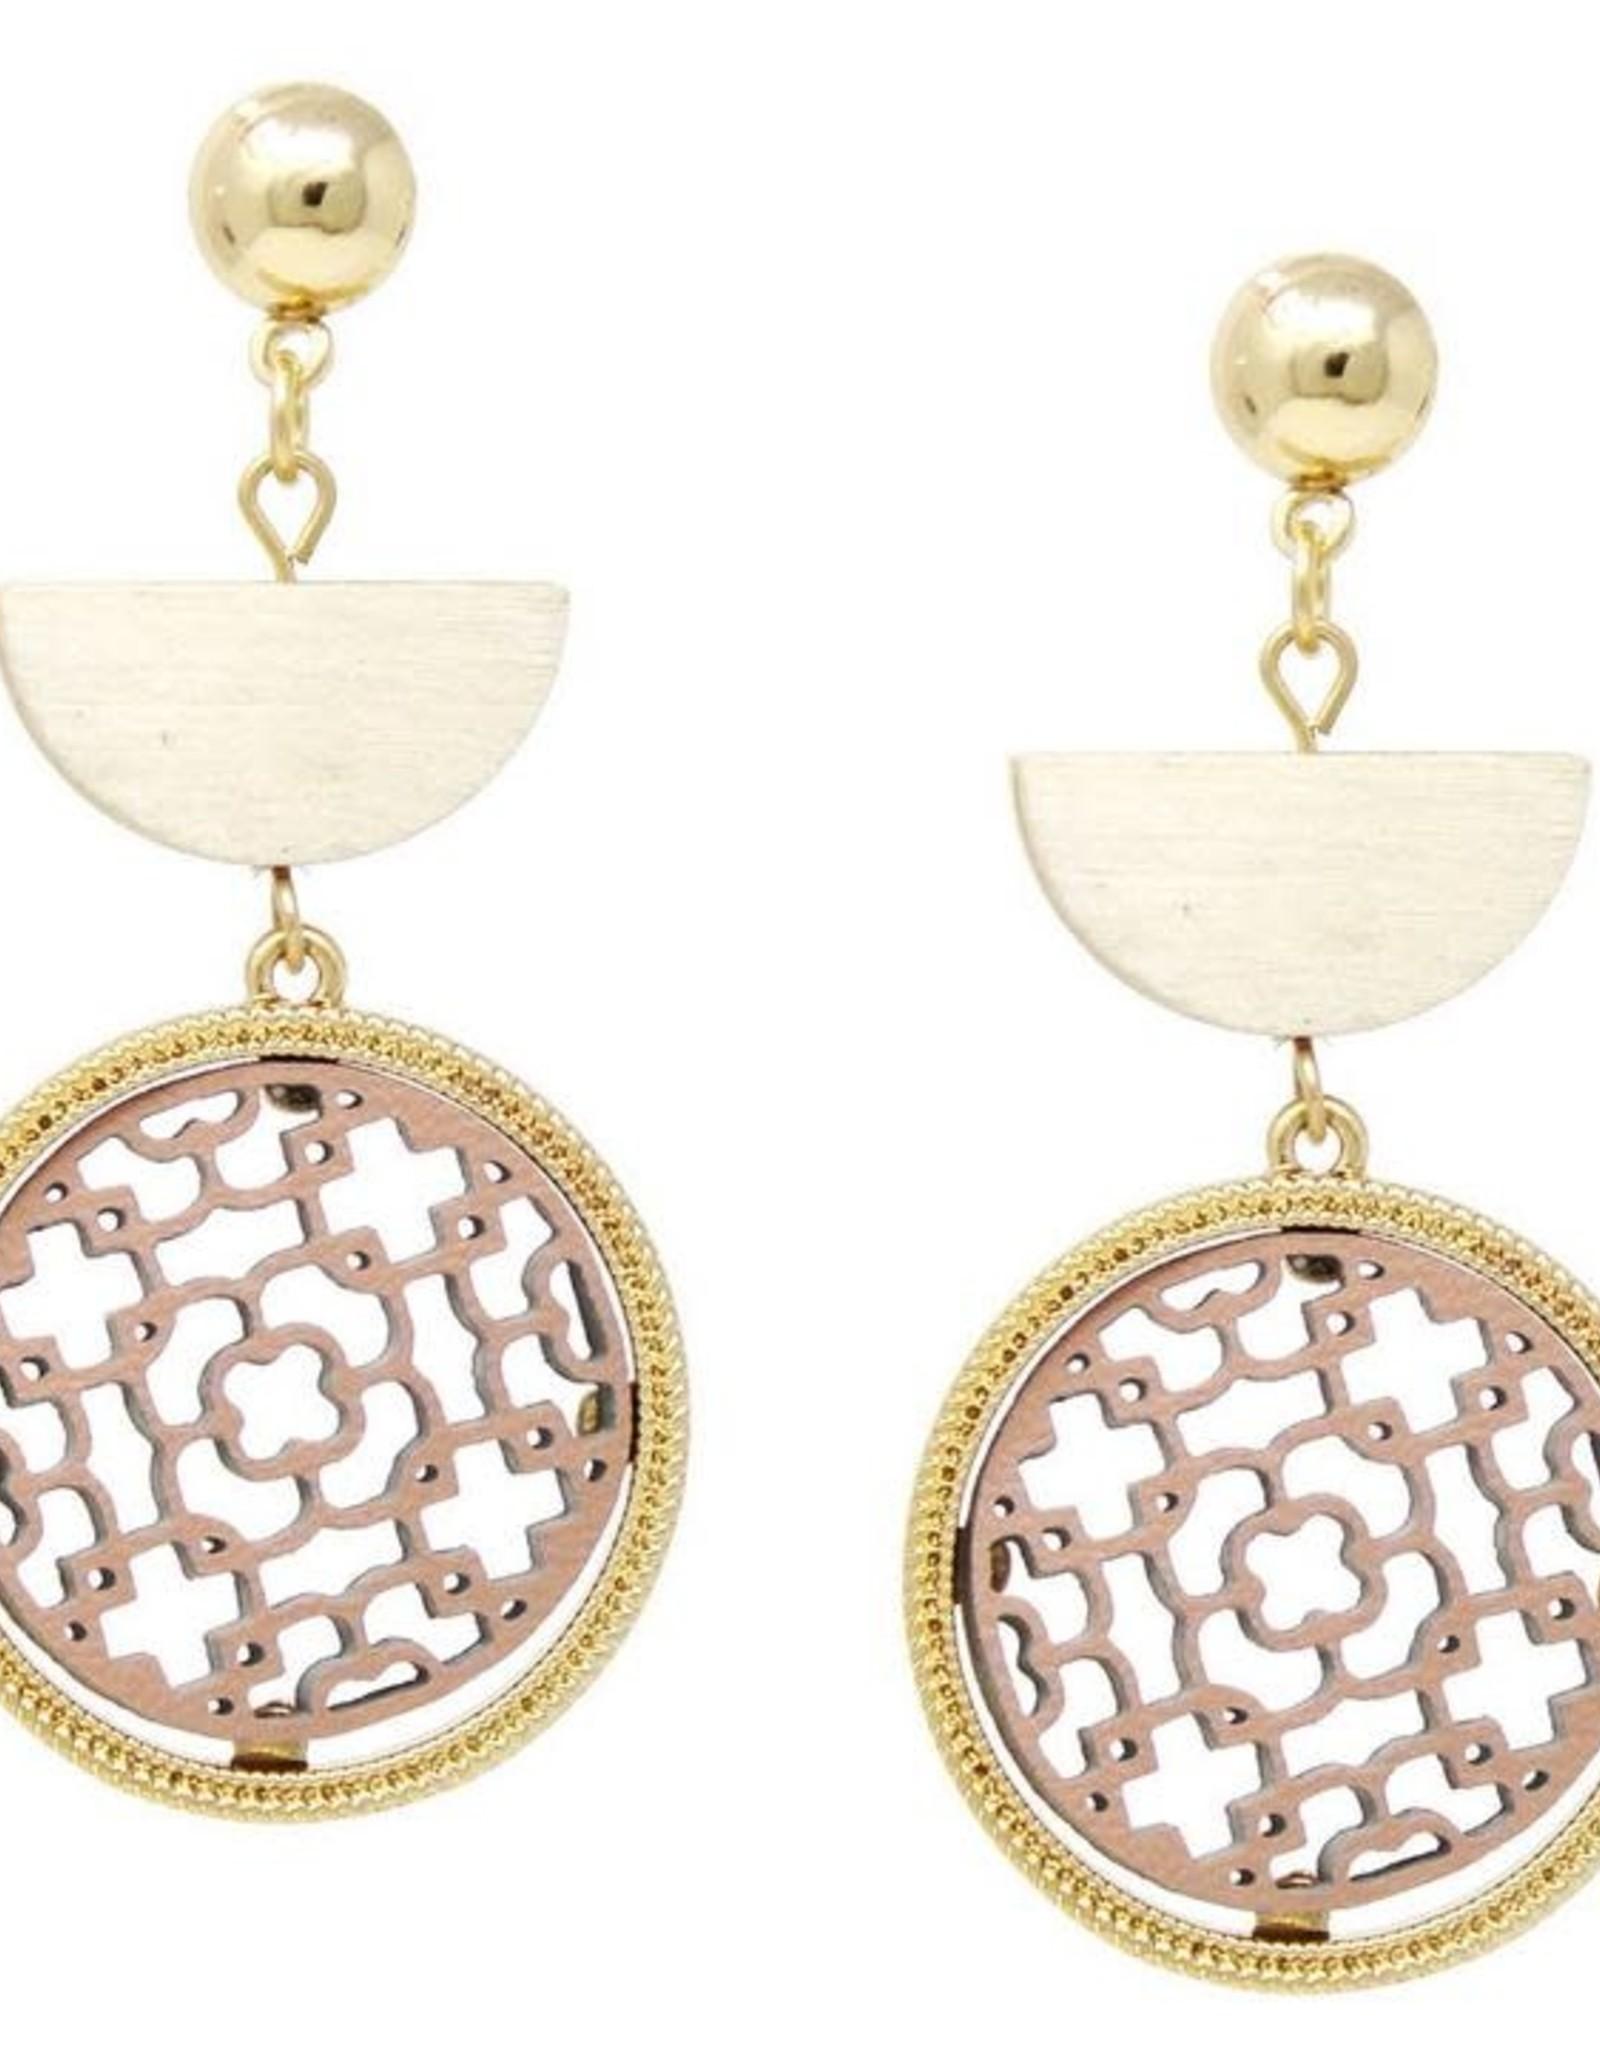 Wooden Half Disc & Leather Cutout Circle Drop Earrings - Worn Gold/Blush